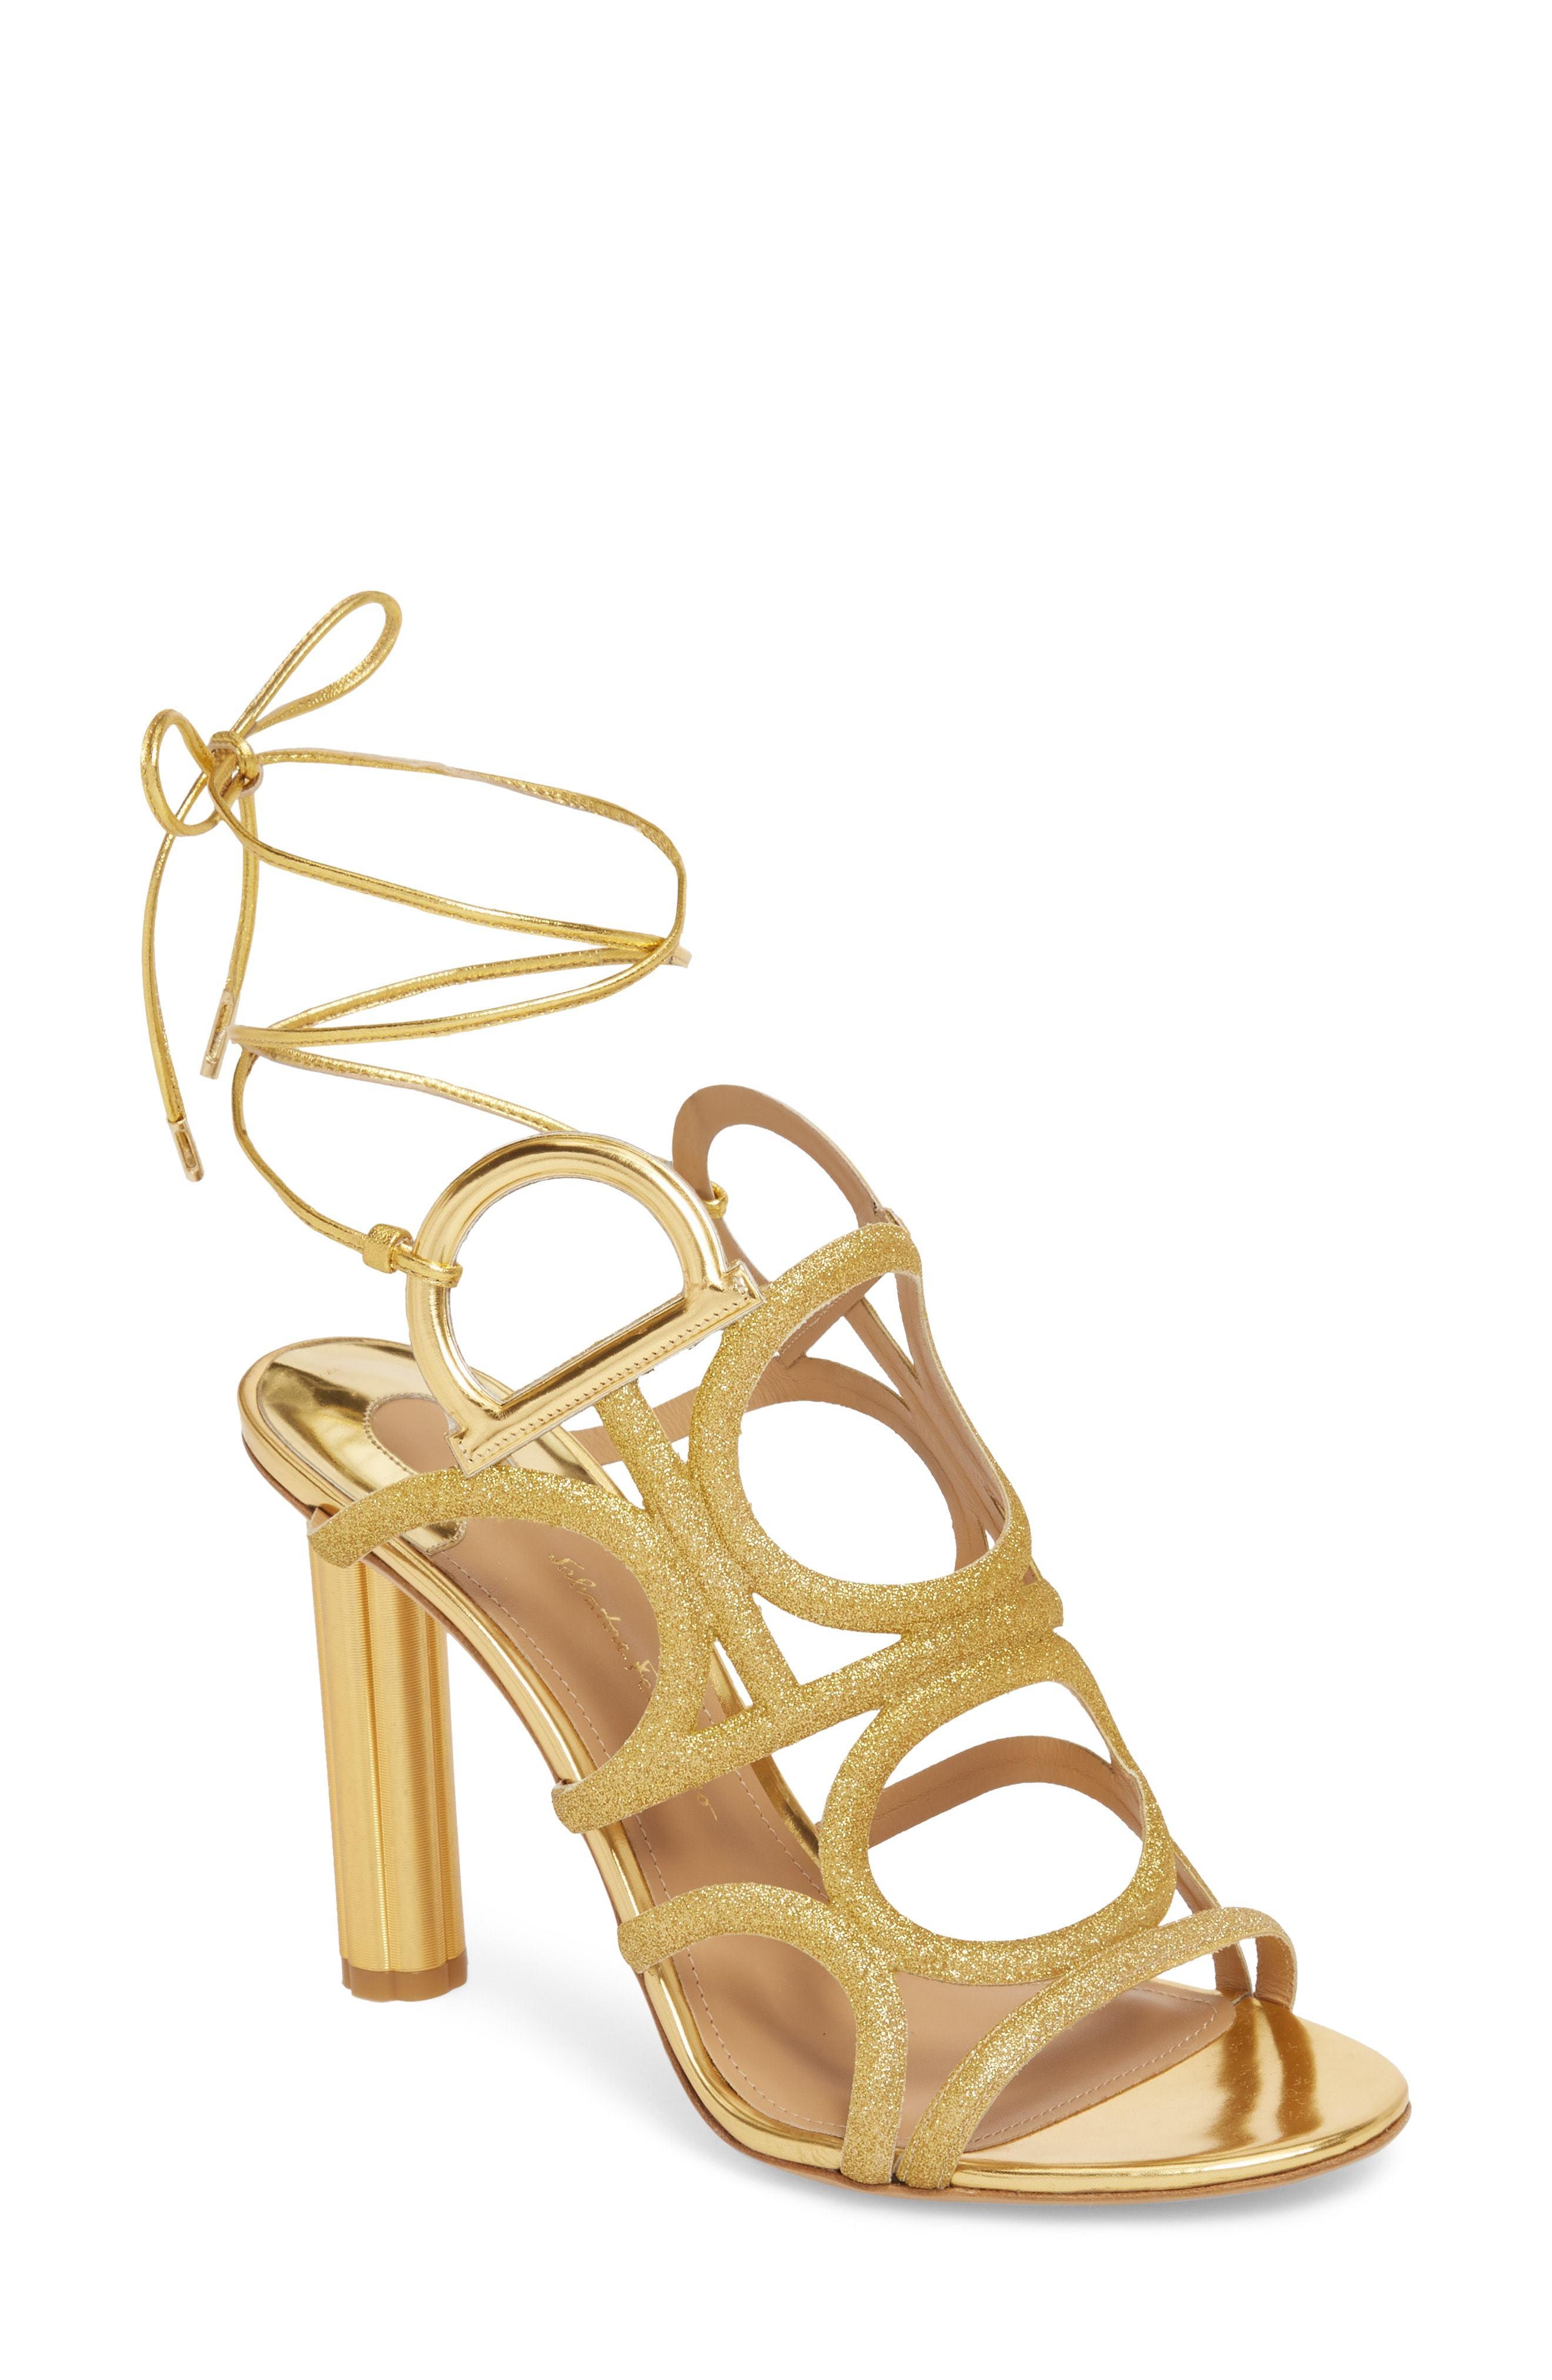 Salvatore Ferragamo Vinci Heeled Sandal